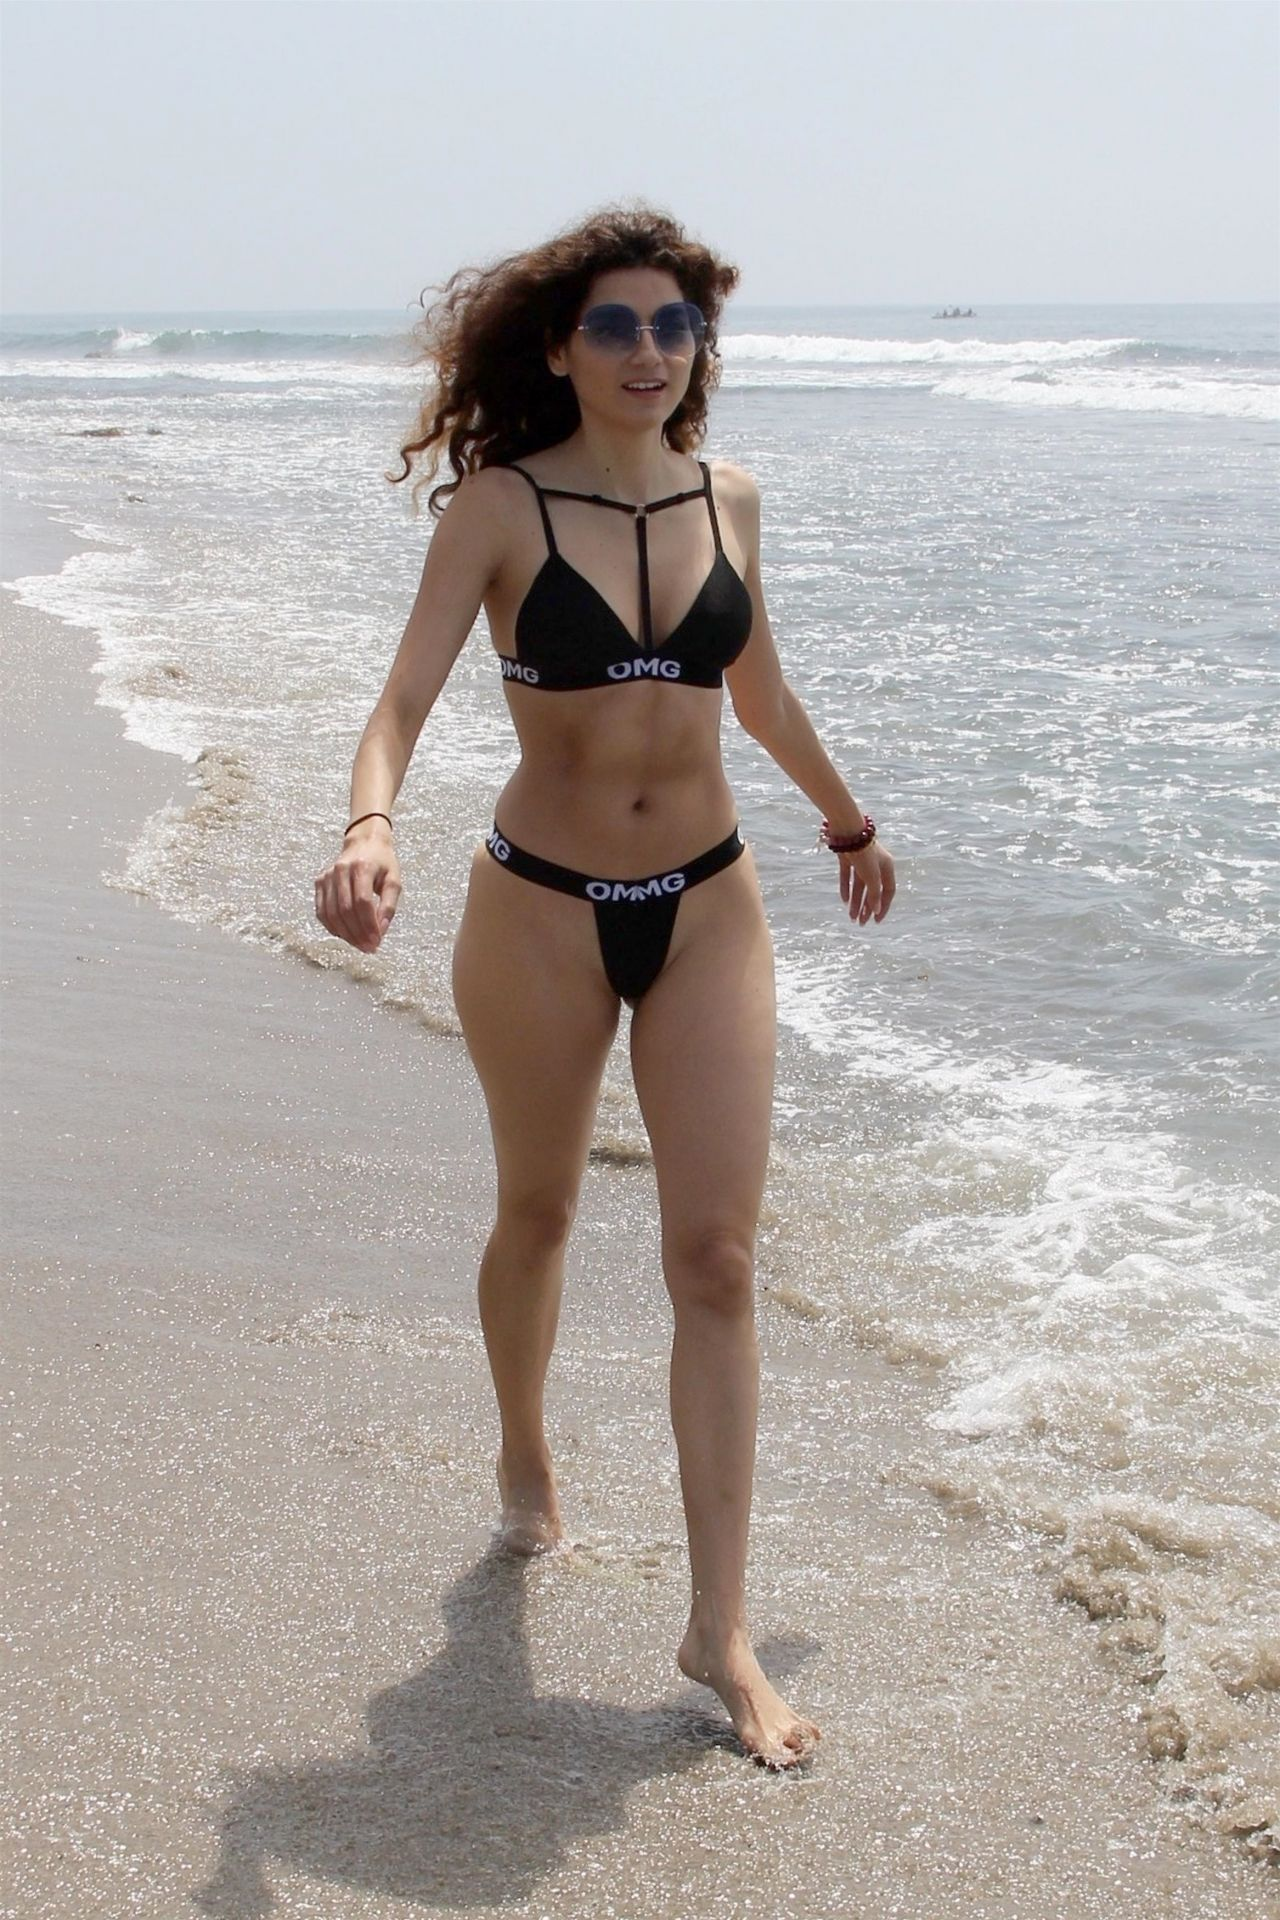 Selfie Sabrina Carpenter nude (91 foto and video), Topless, Leaked, Feet, lingerie 2015